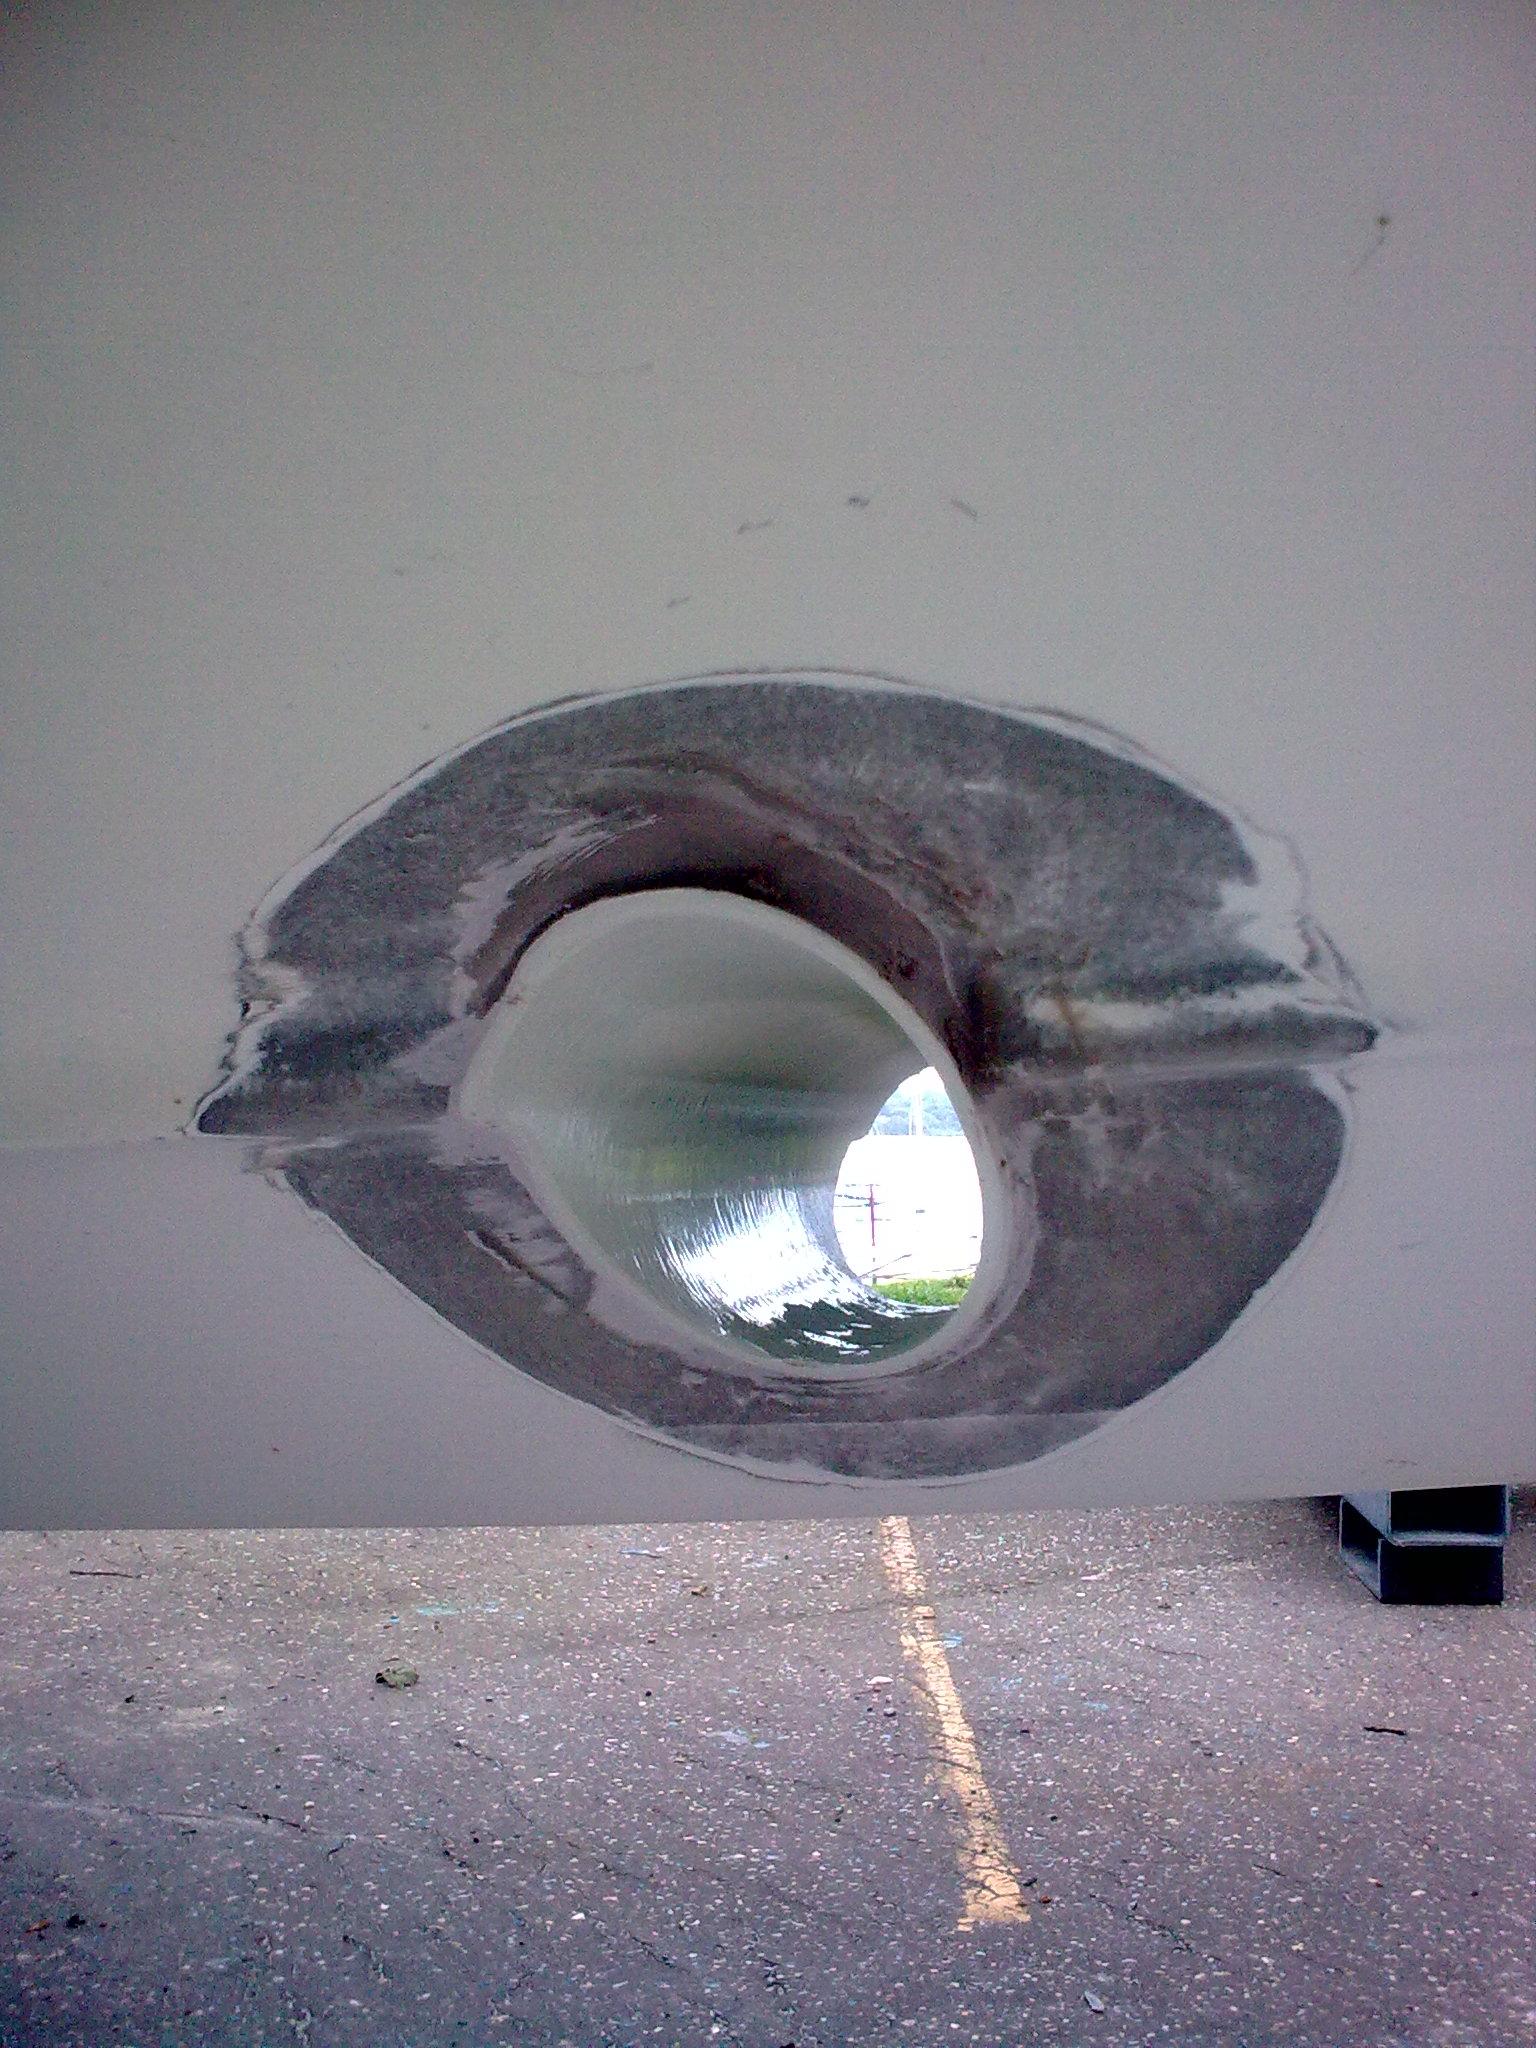 Bow Thruster Installation